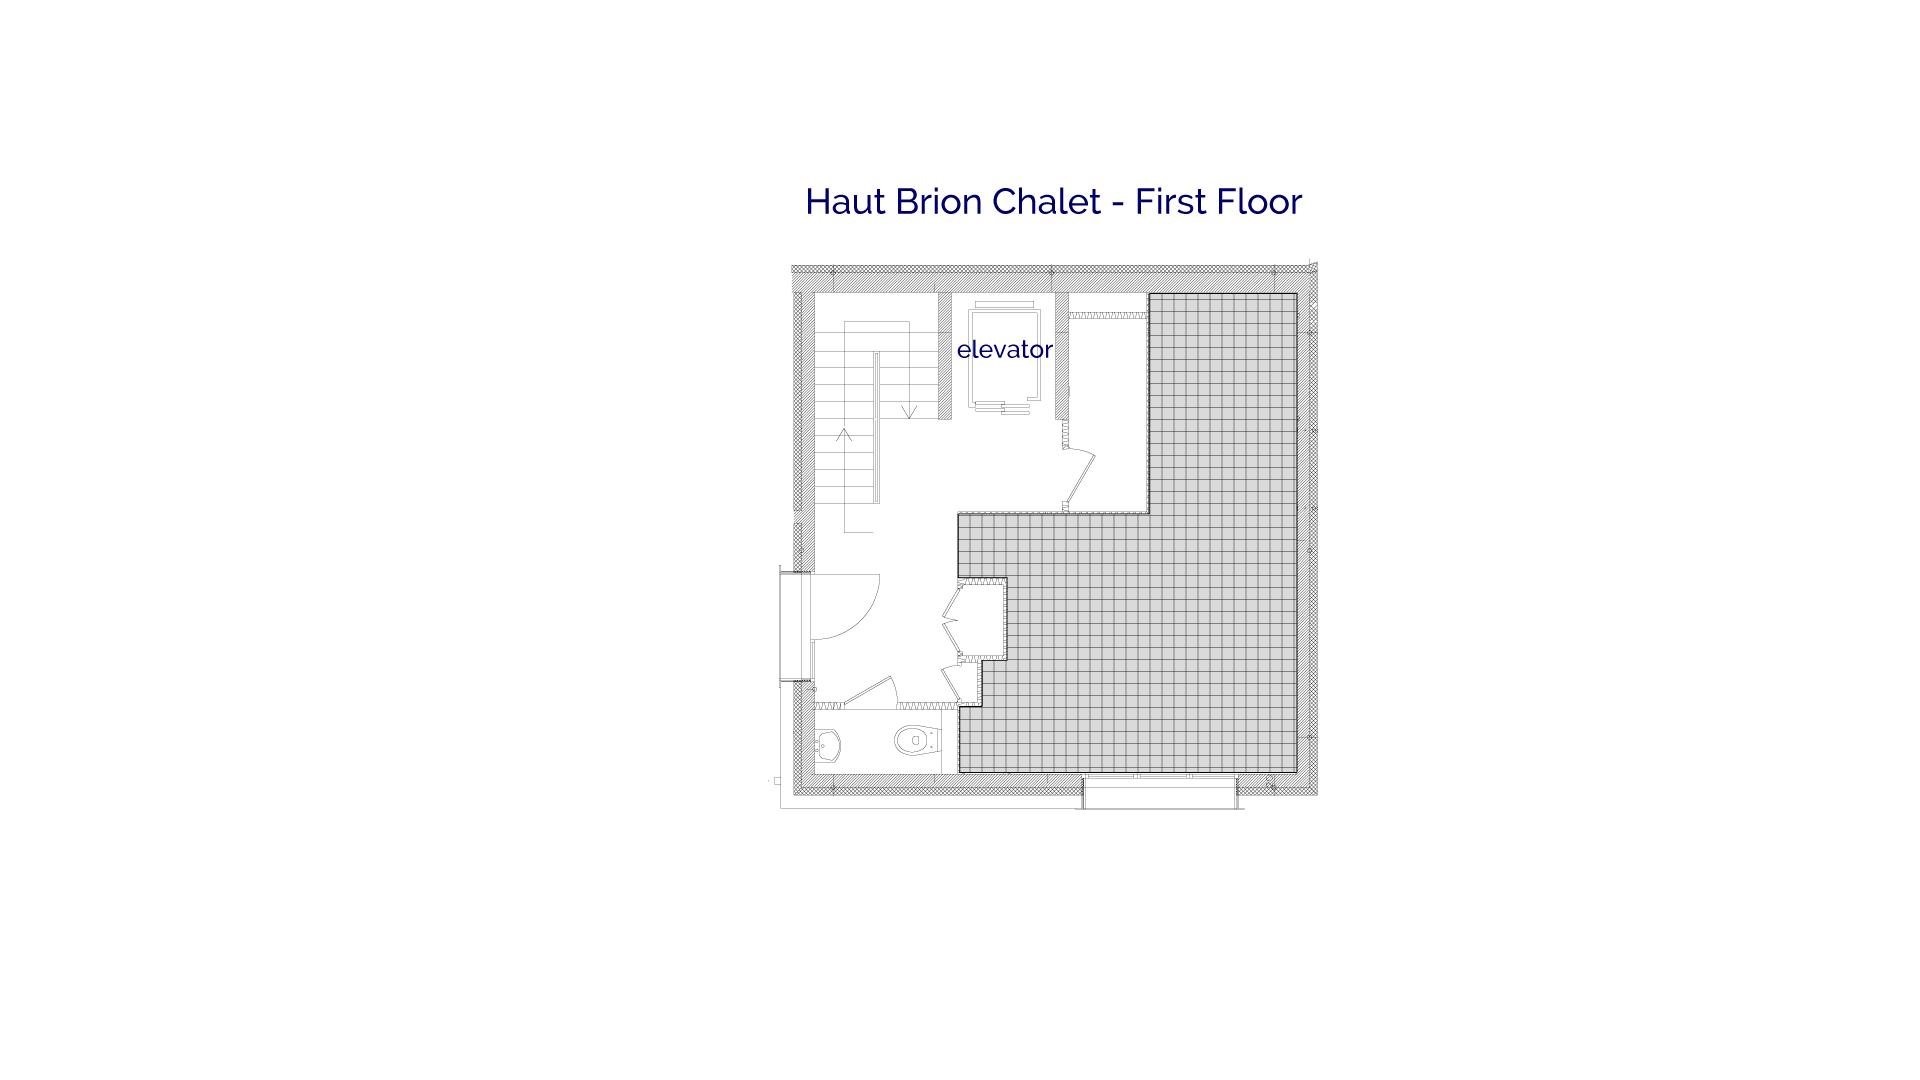 Haut Brion luxury self catered chalet in Sainte Foy, 1st floor plans